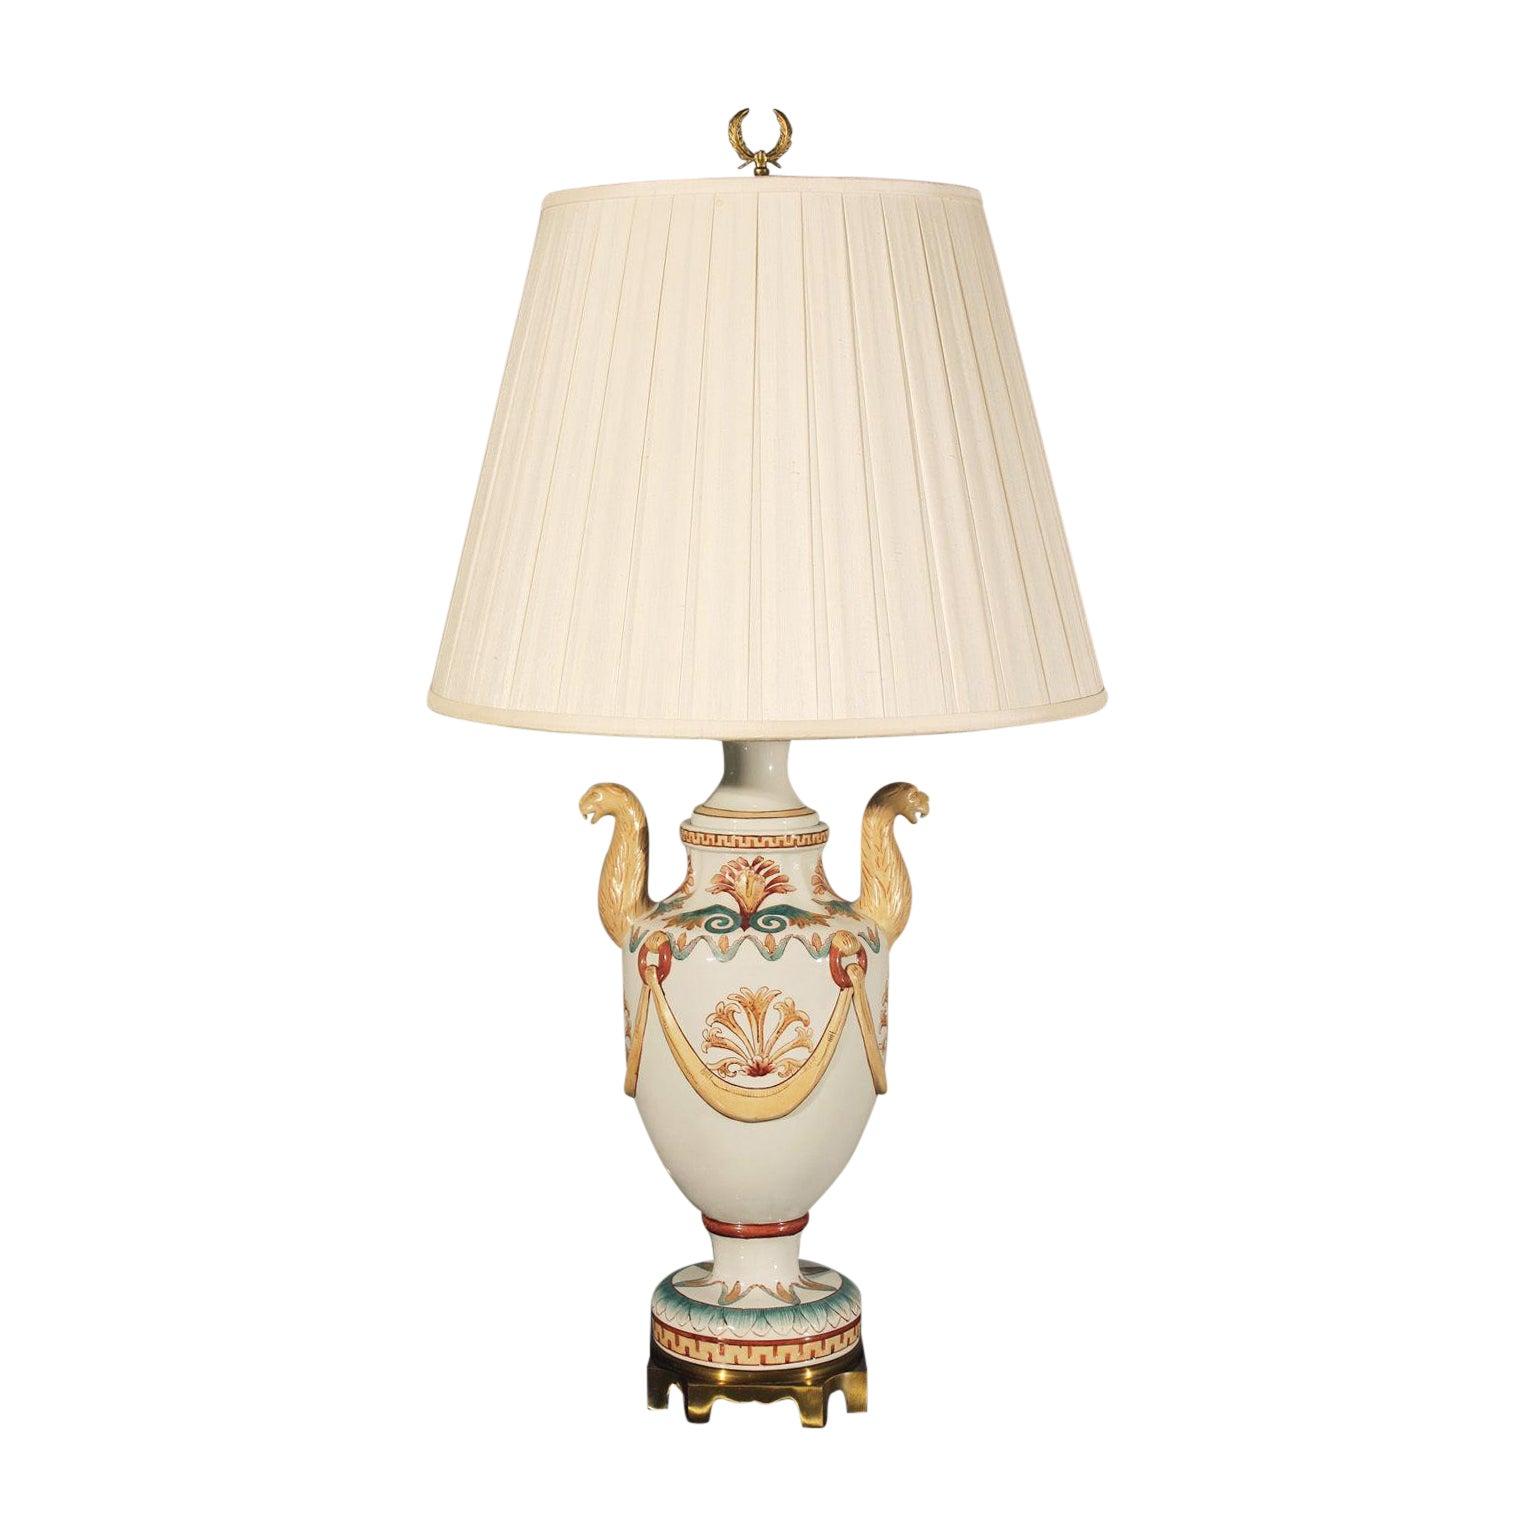 Vintage Maitland Smith Neoclassical Porcelain Lamp Chairish